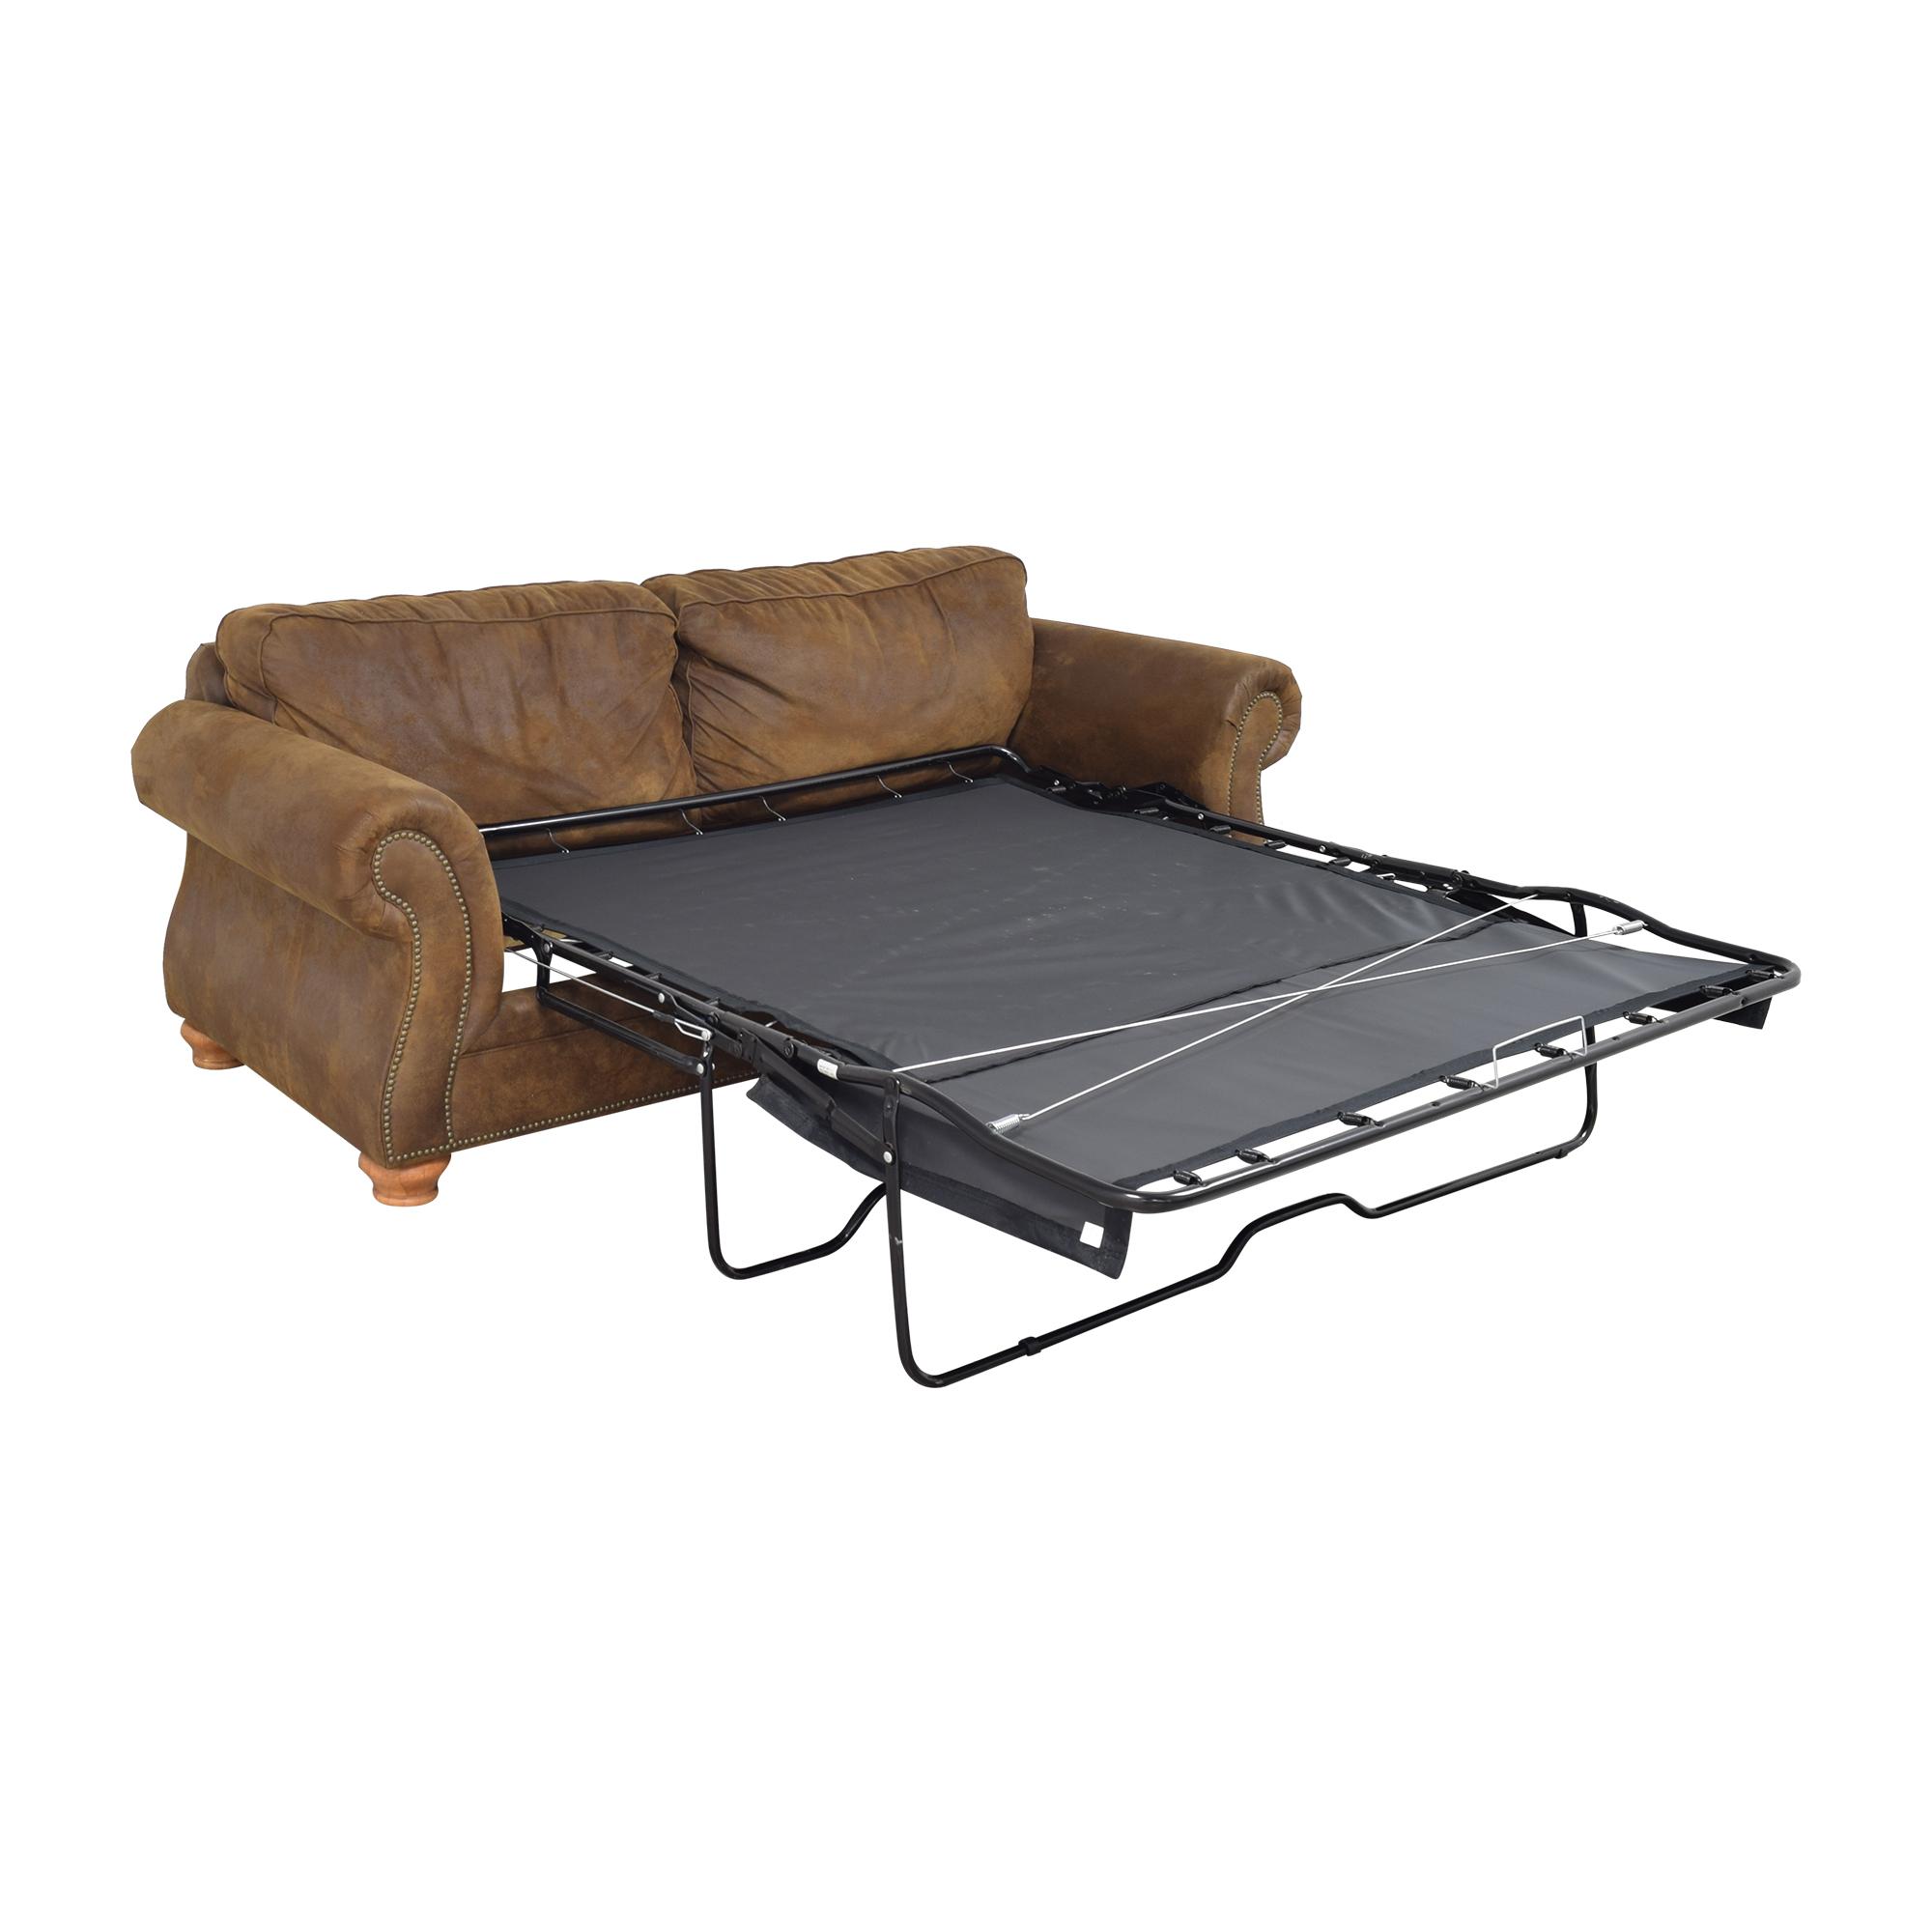 buy Raymour & Flanigan Canyon Ridge Sleeper Sofa Raymour & Flanigan Sofas